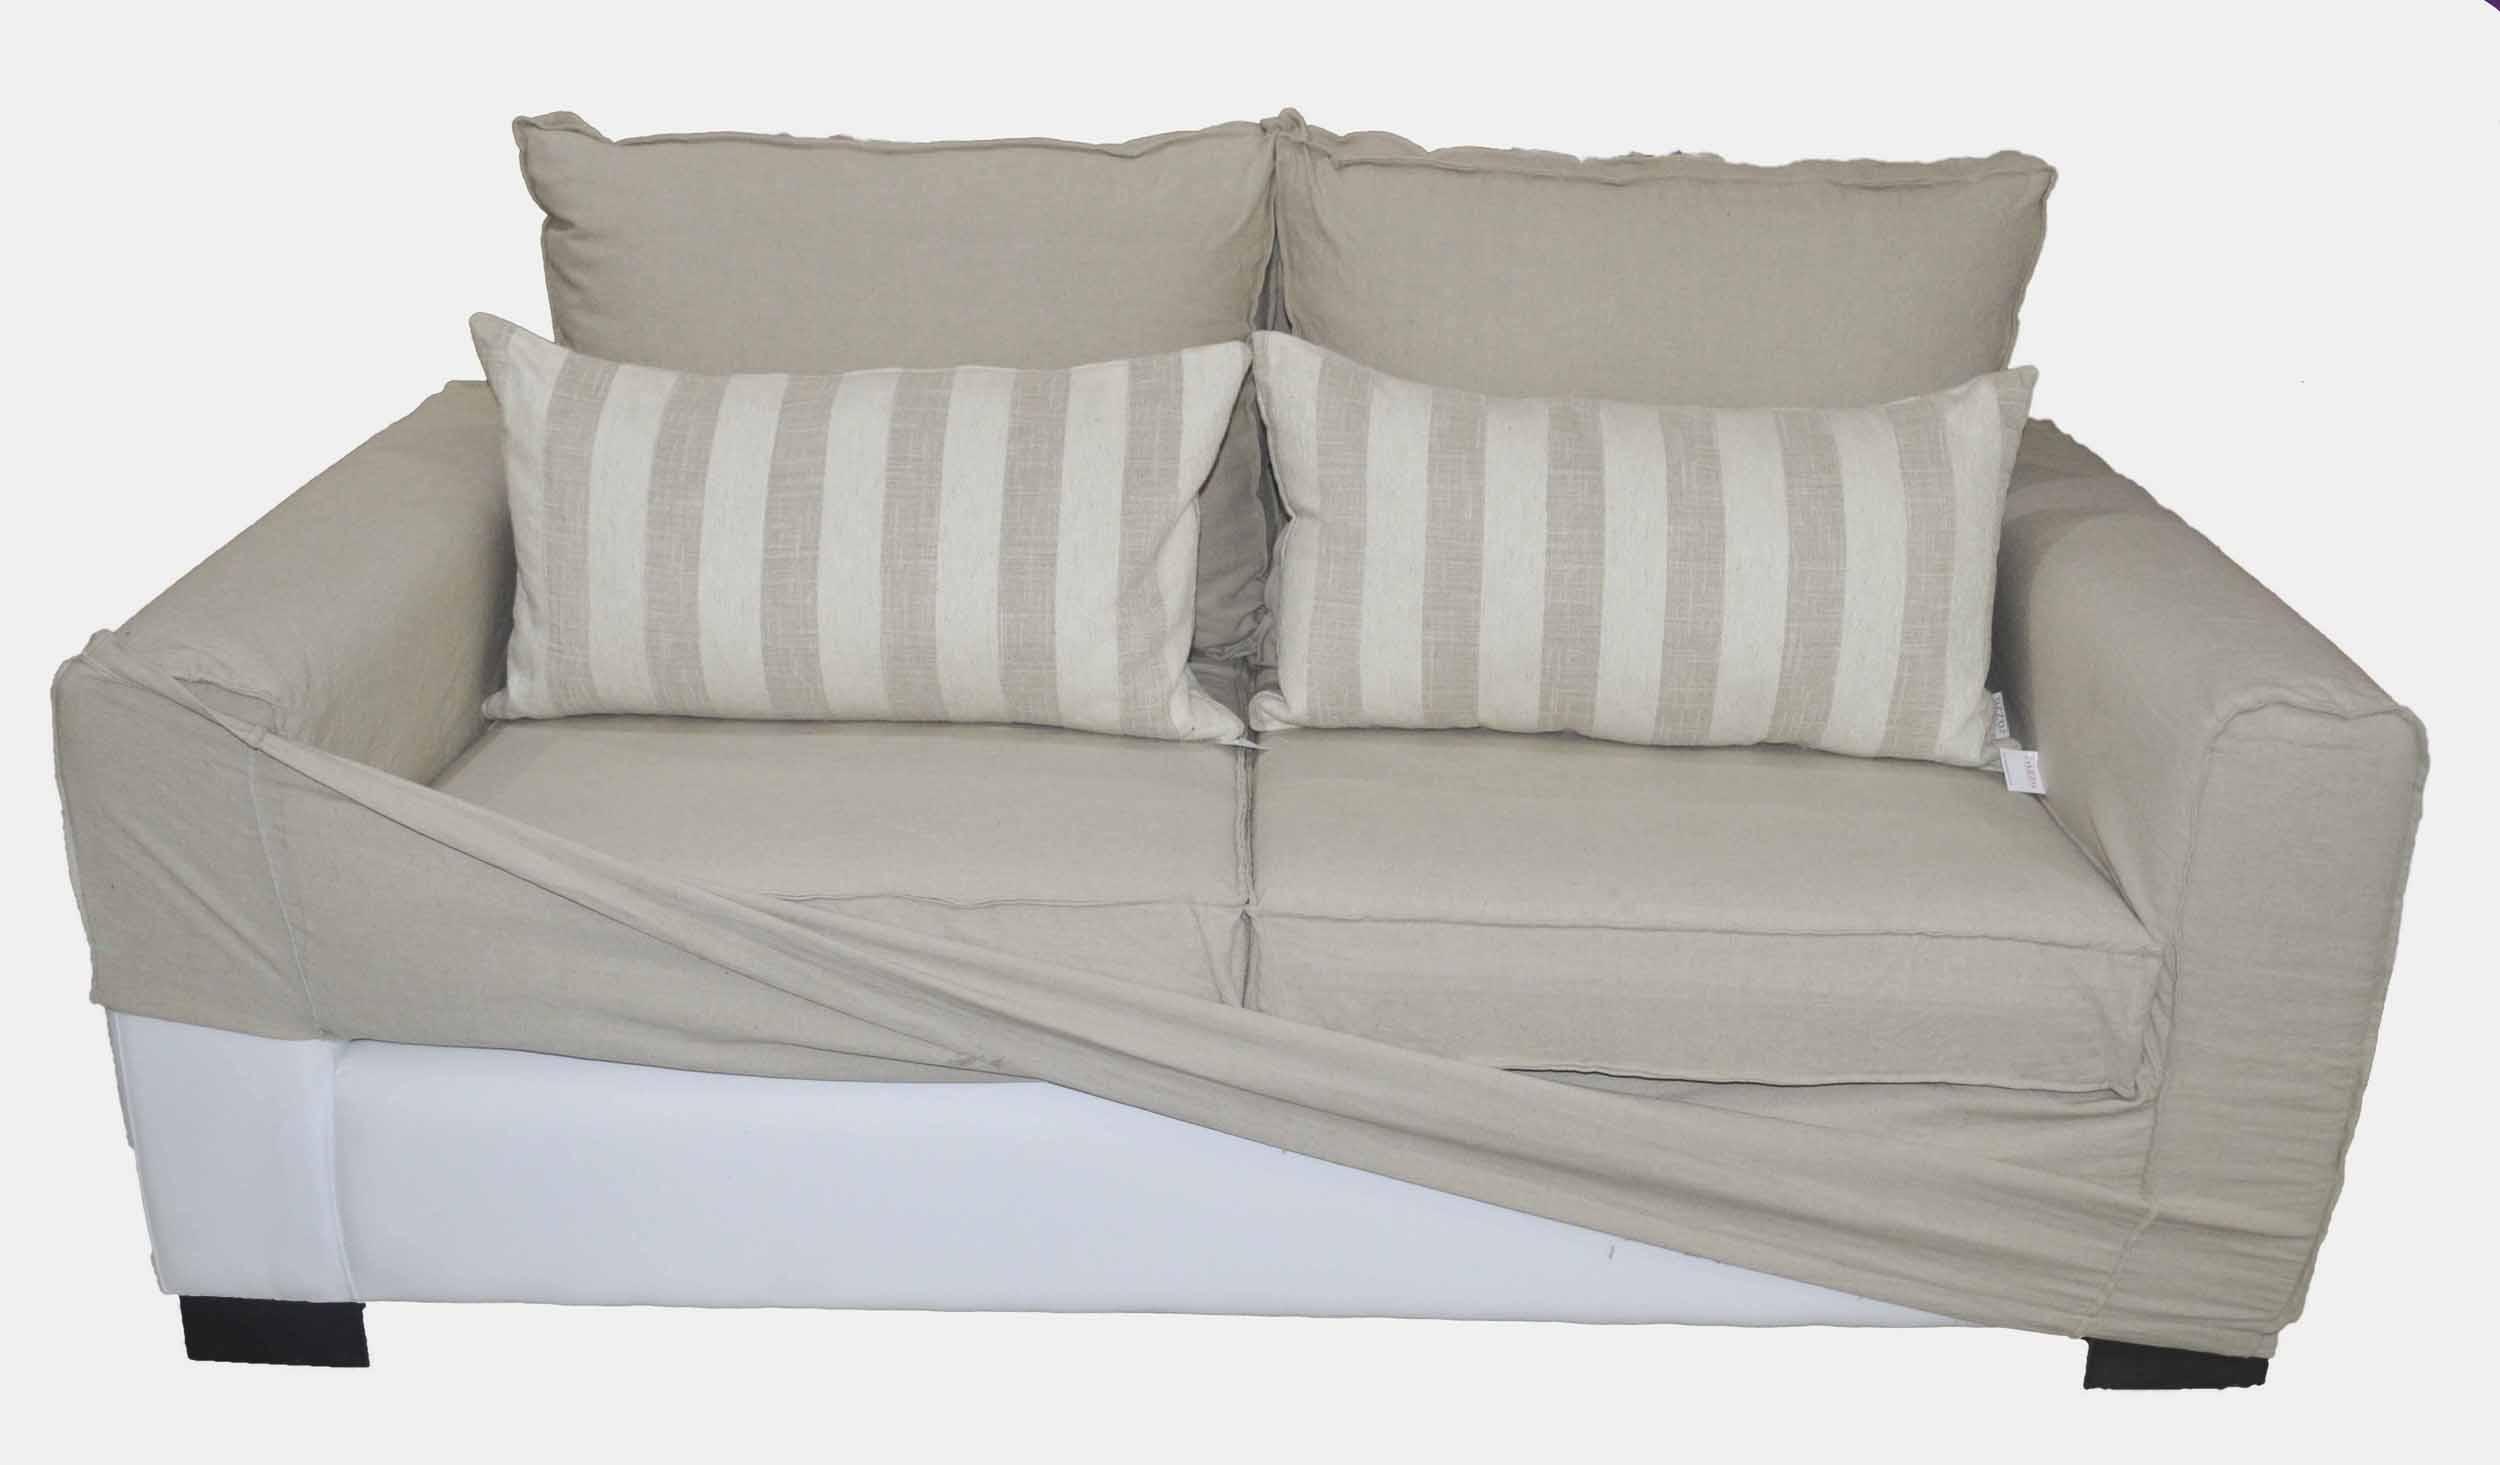 Sofa renata con funda en lino - Fundas a medida para sofas ...